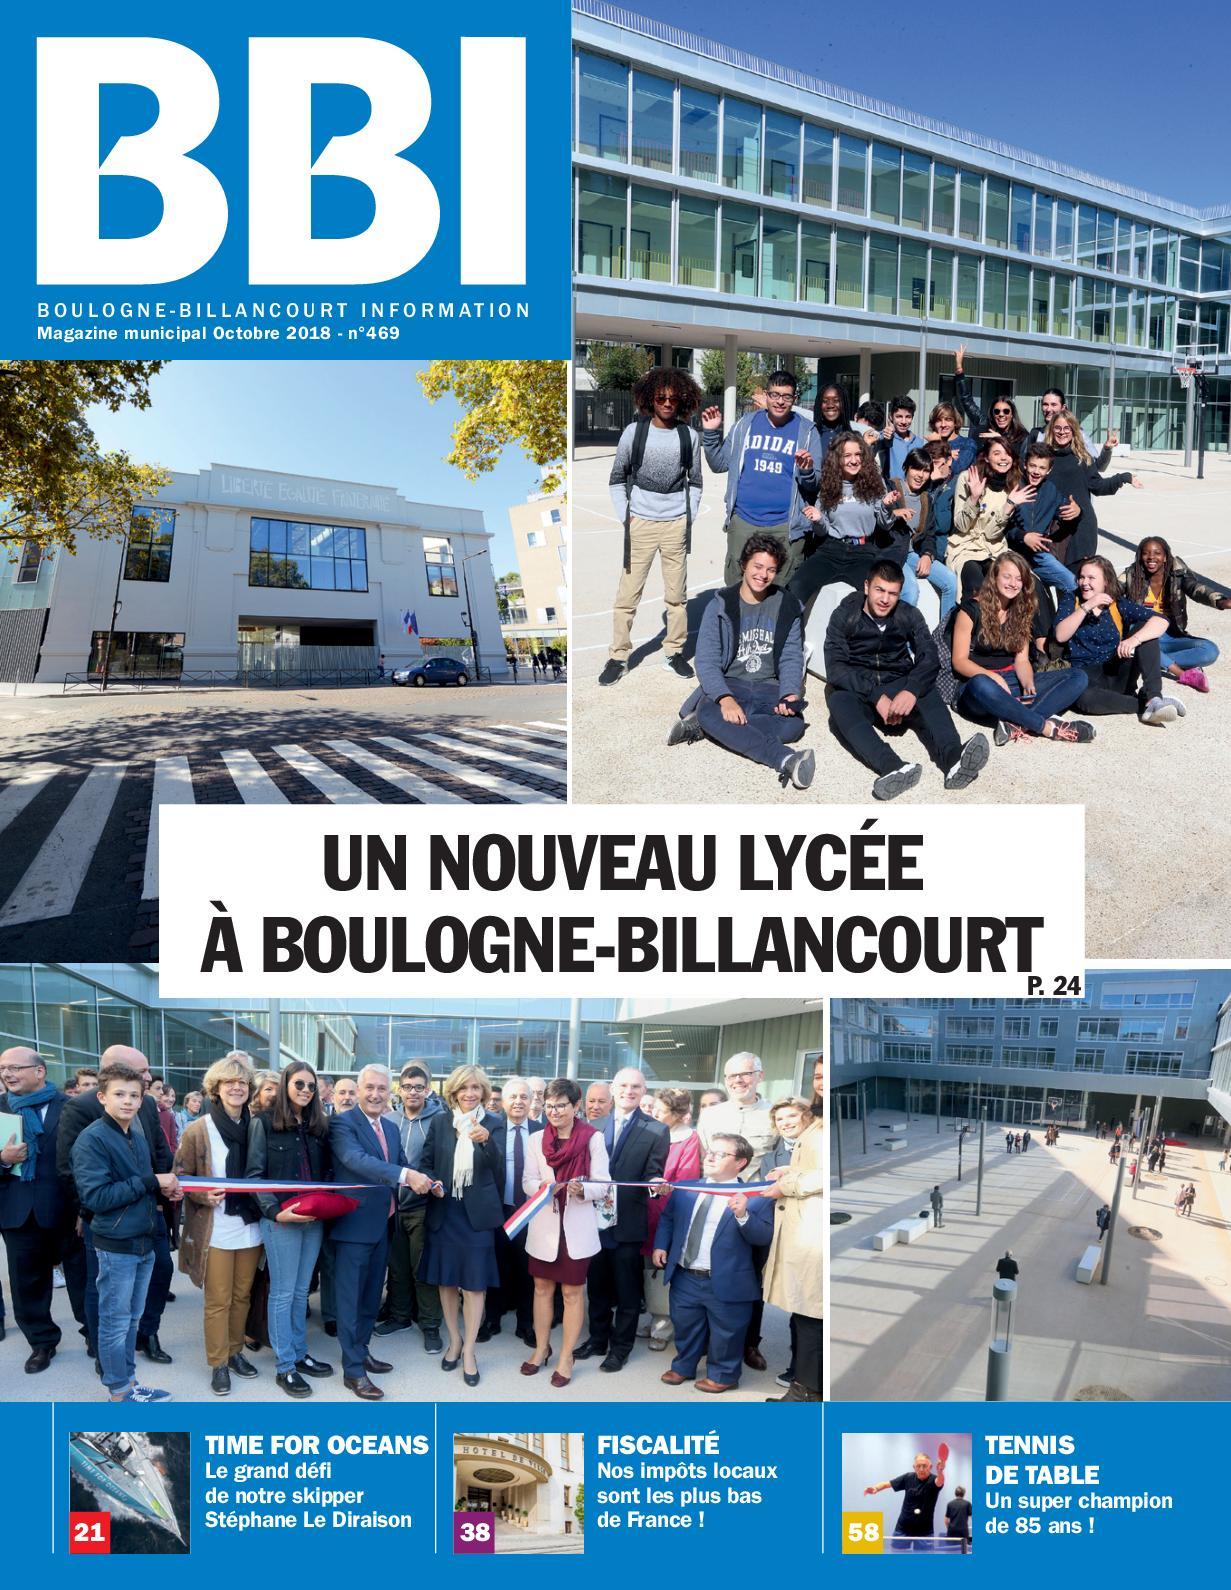 Billancourt Boulogne 2018 Information Calaméo Octobre nwv8mNO0